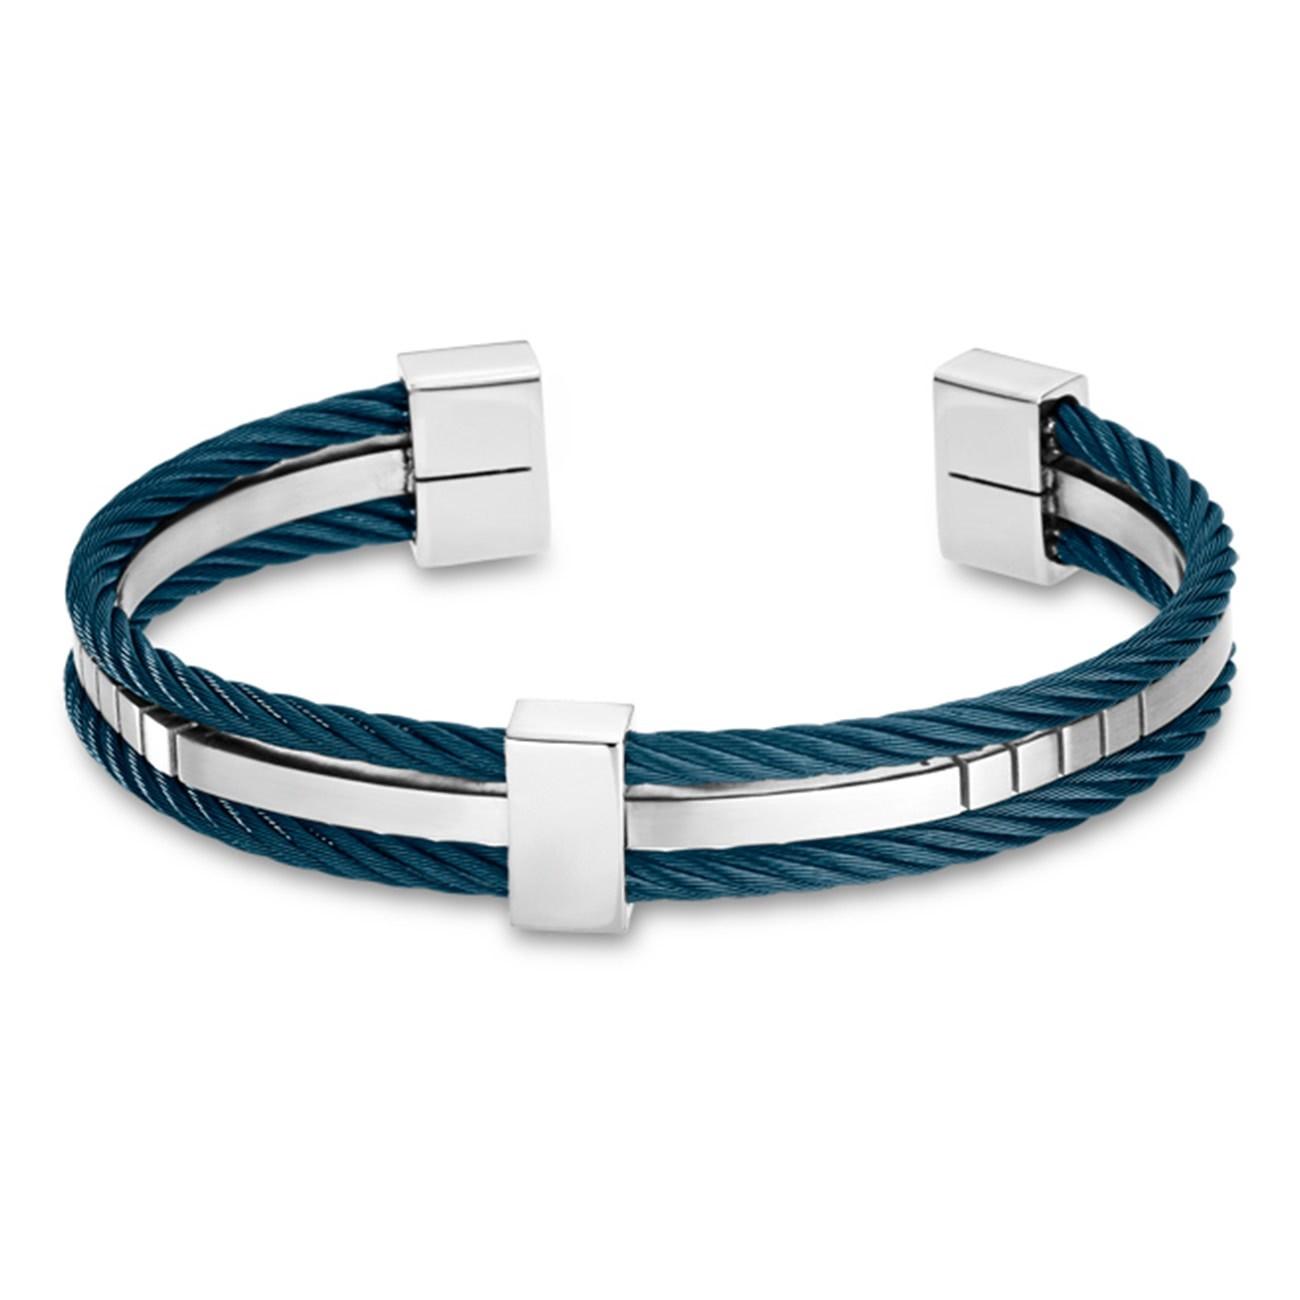 LOTUS Style Armreif Herren Edelstahl silber blau LS1807-2/2 Urban JLS1807-2-2